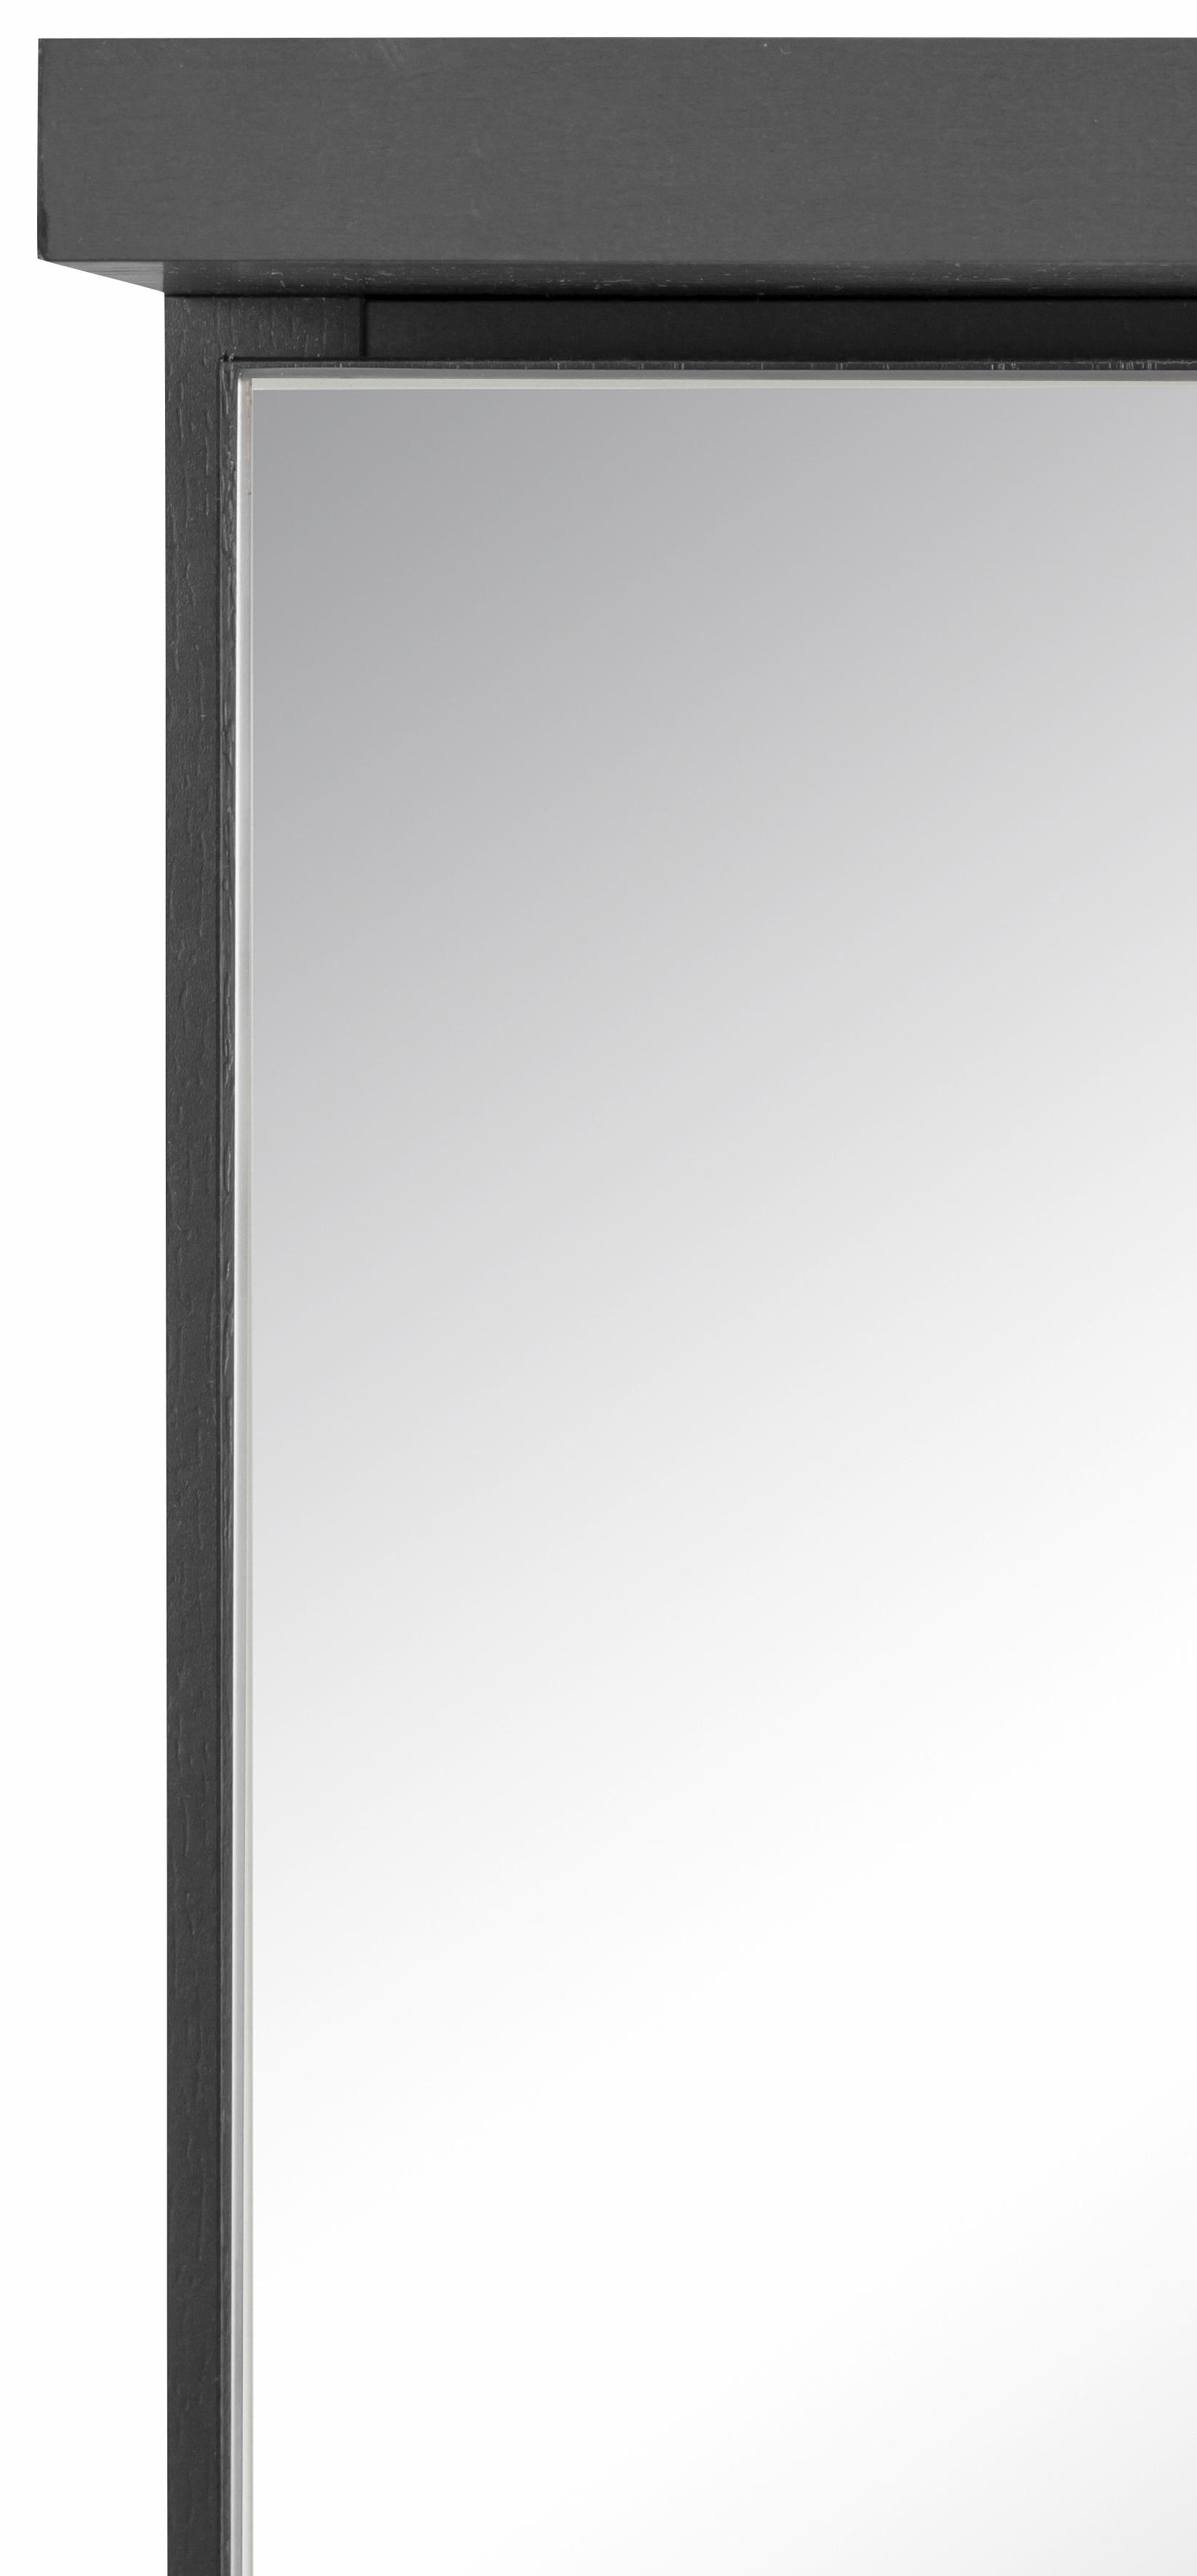 Held m bel spiegelkast ravenna breedte 60 cm makkelijk for Spiegelkast 60 cm breed